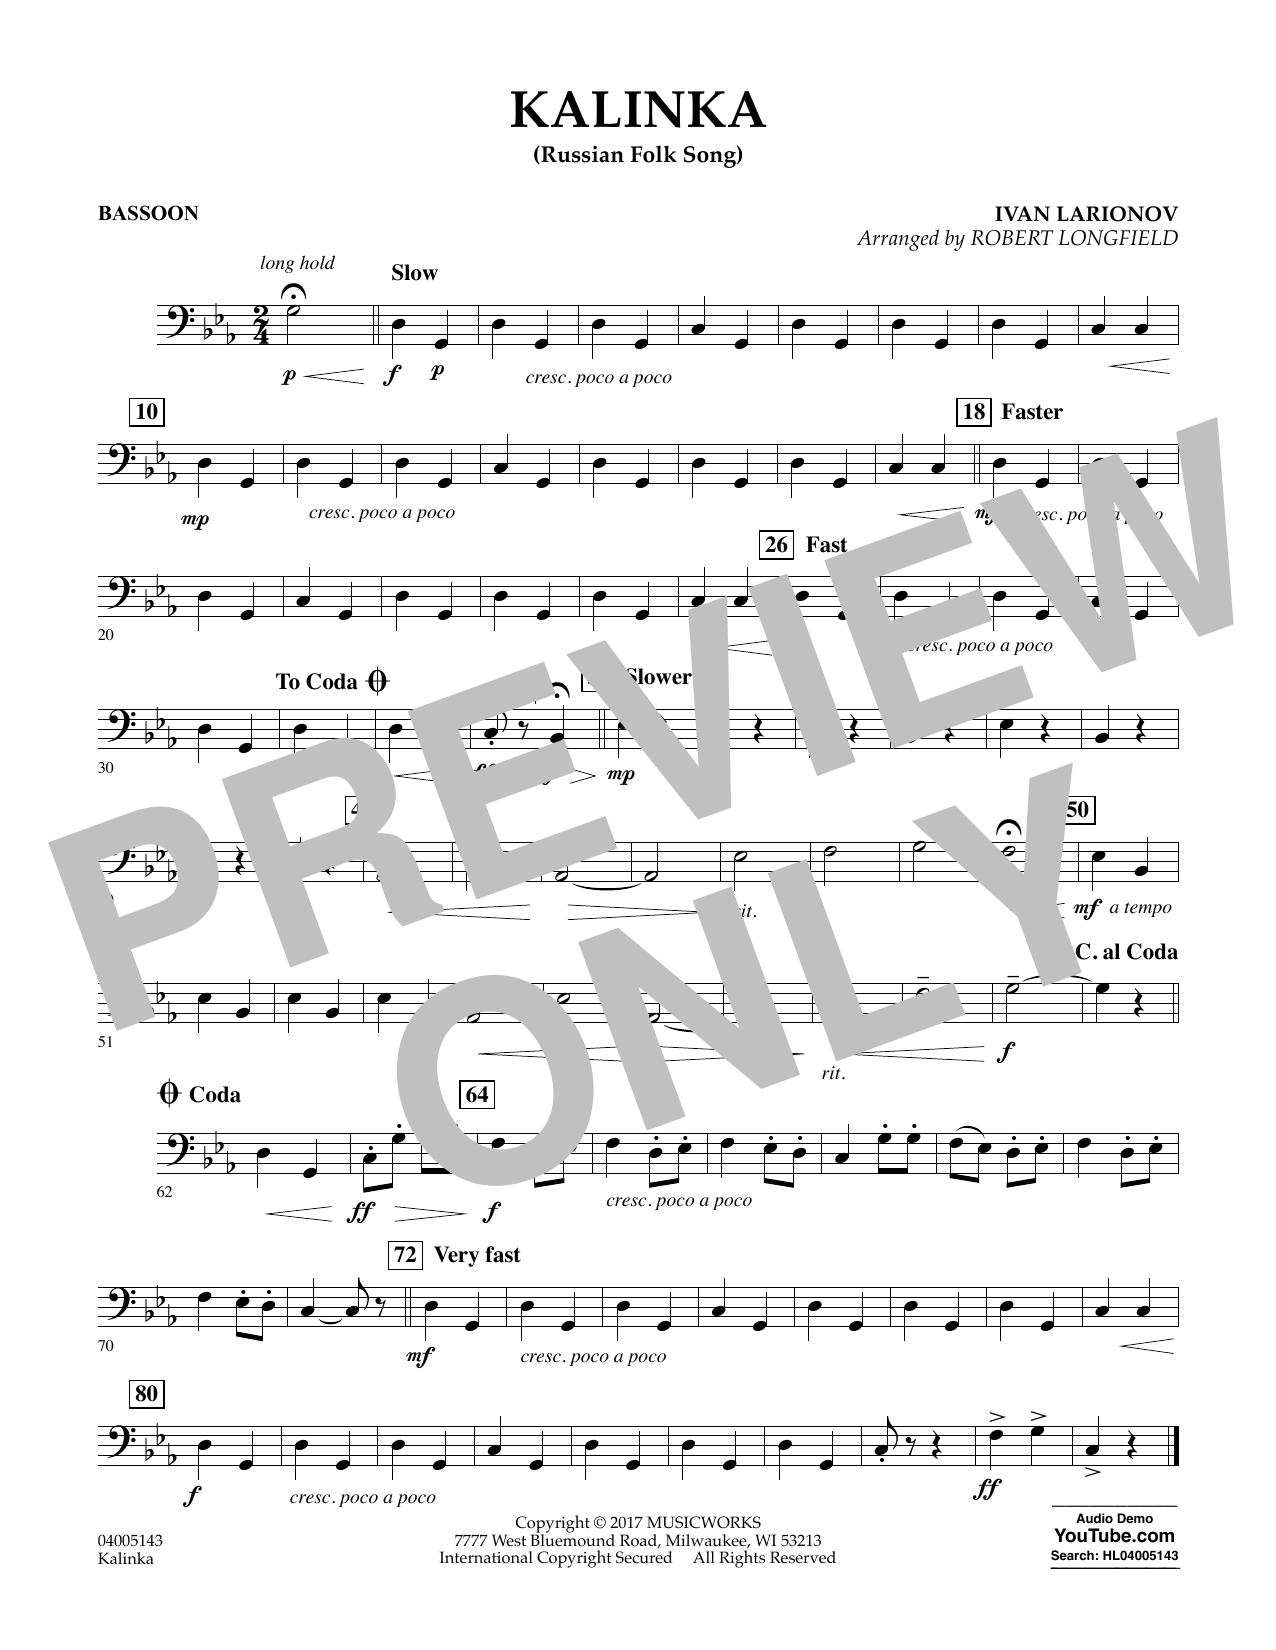 Robert Longfield Kalinka (Russian Folk Song) - Bassoon sheet music notes and chords. Download Printable PDF.